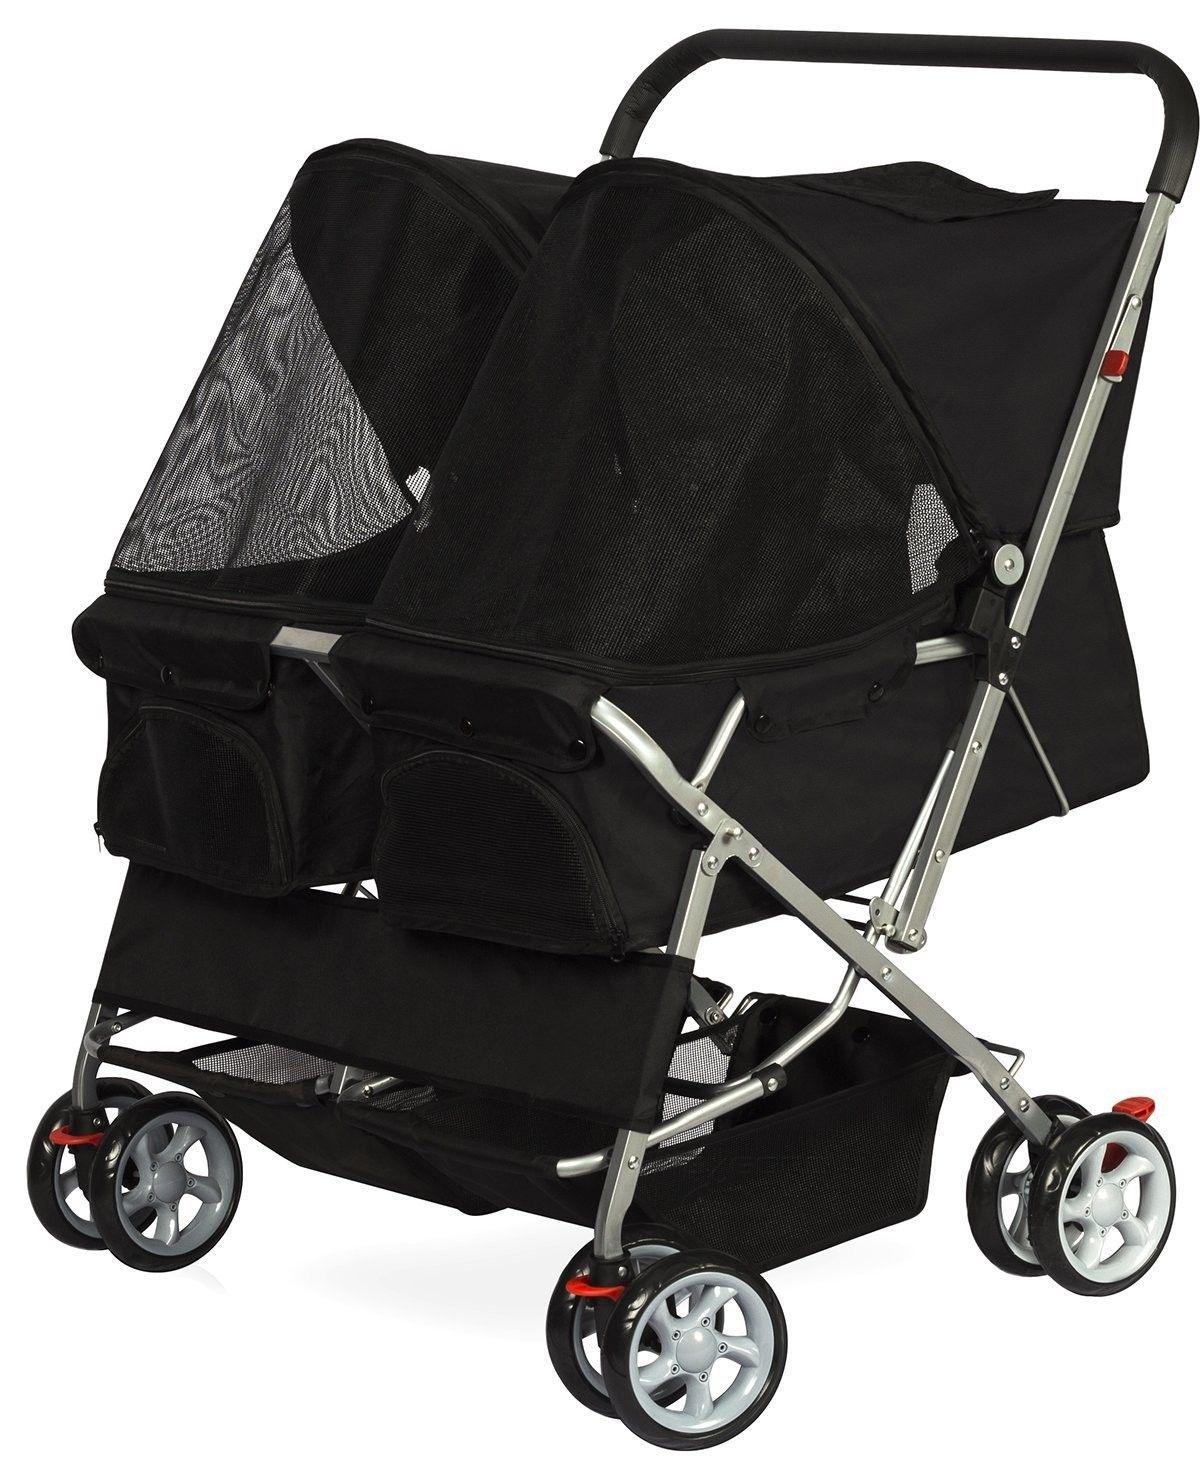 Folding Standard Stroller Cat stroller, Dog stroller